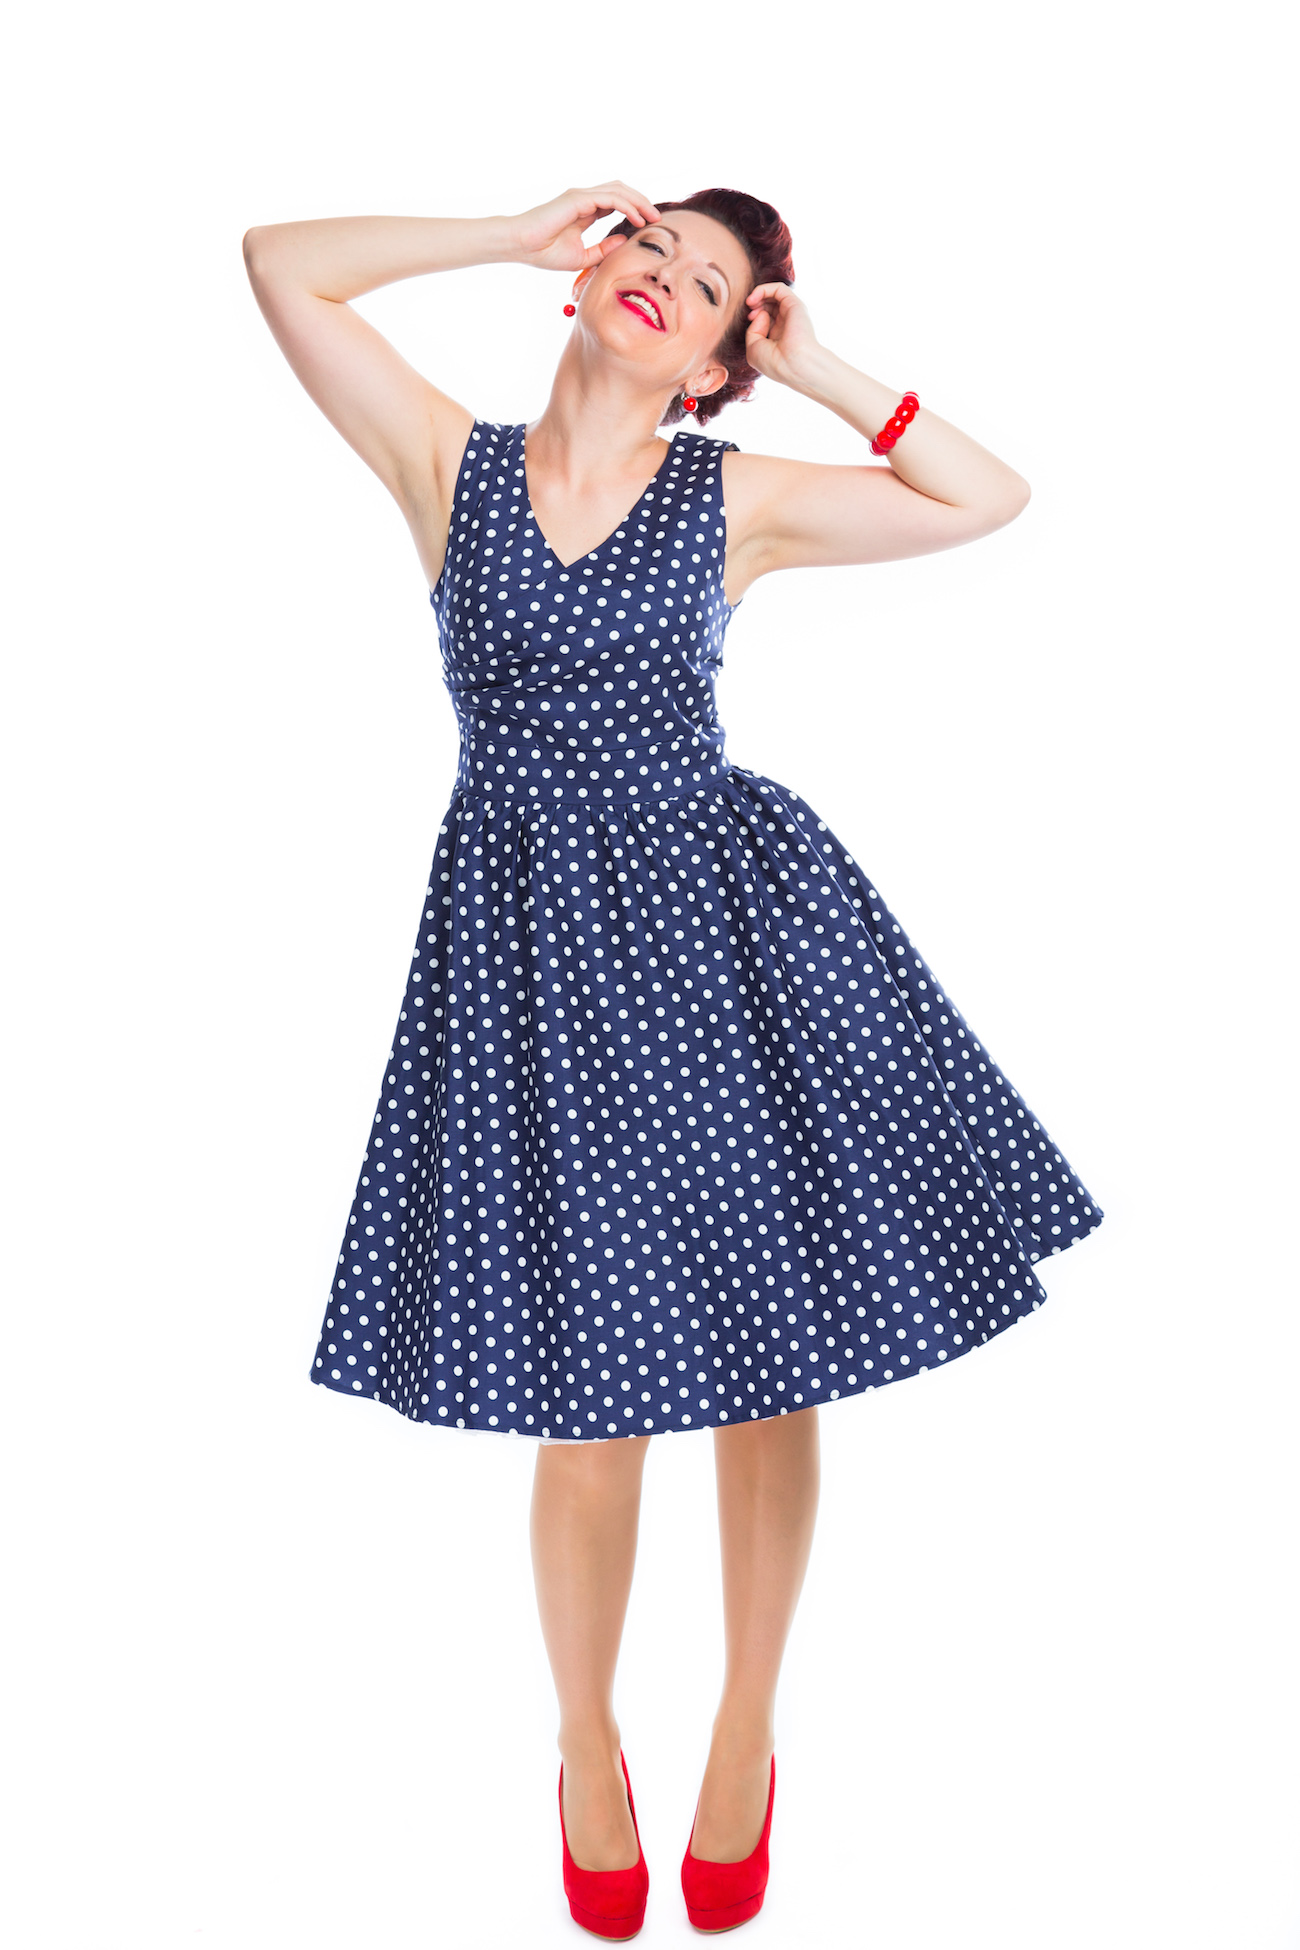 Štylové modré retro šaty s bílýmy puntíky d01bfbbf1a